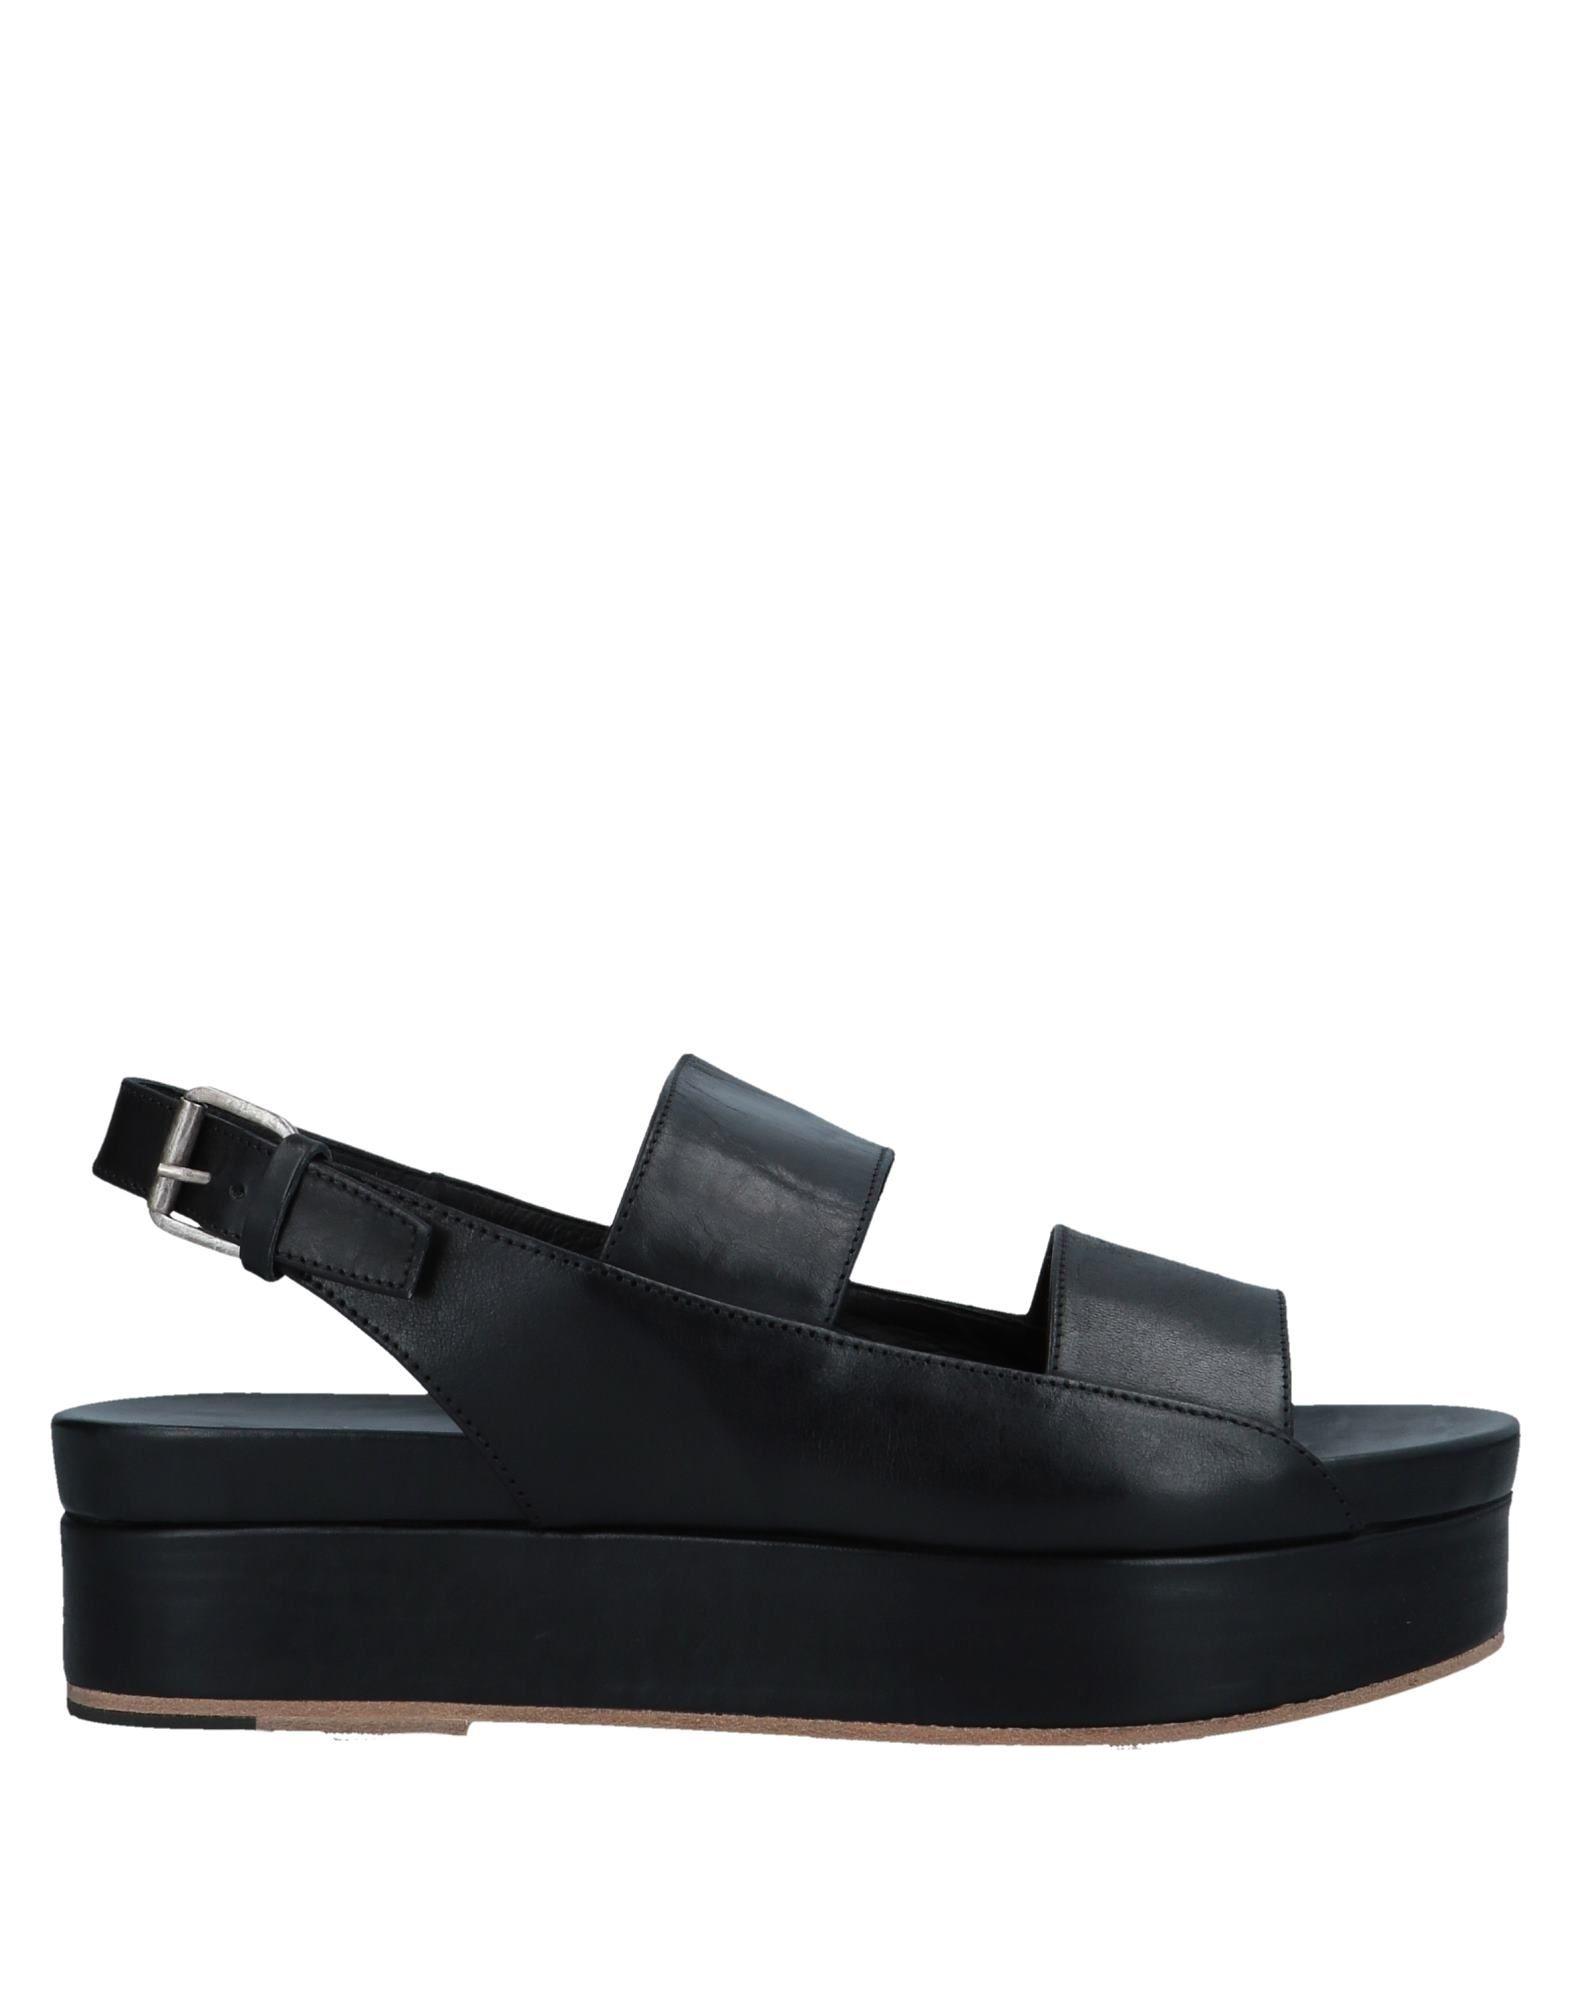 I.N.K. Shoes Сандалии shoes and more сандалии